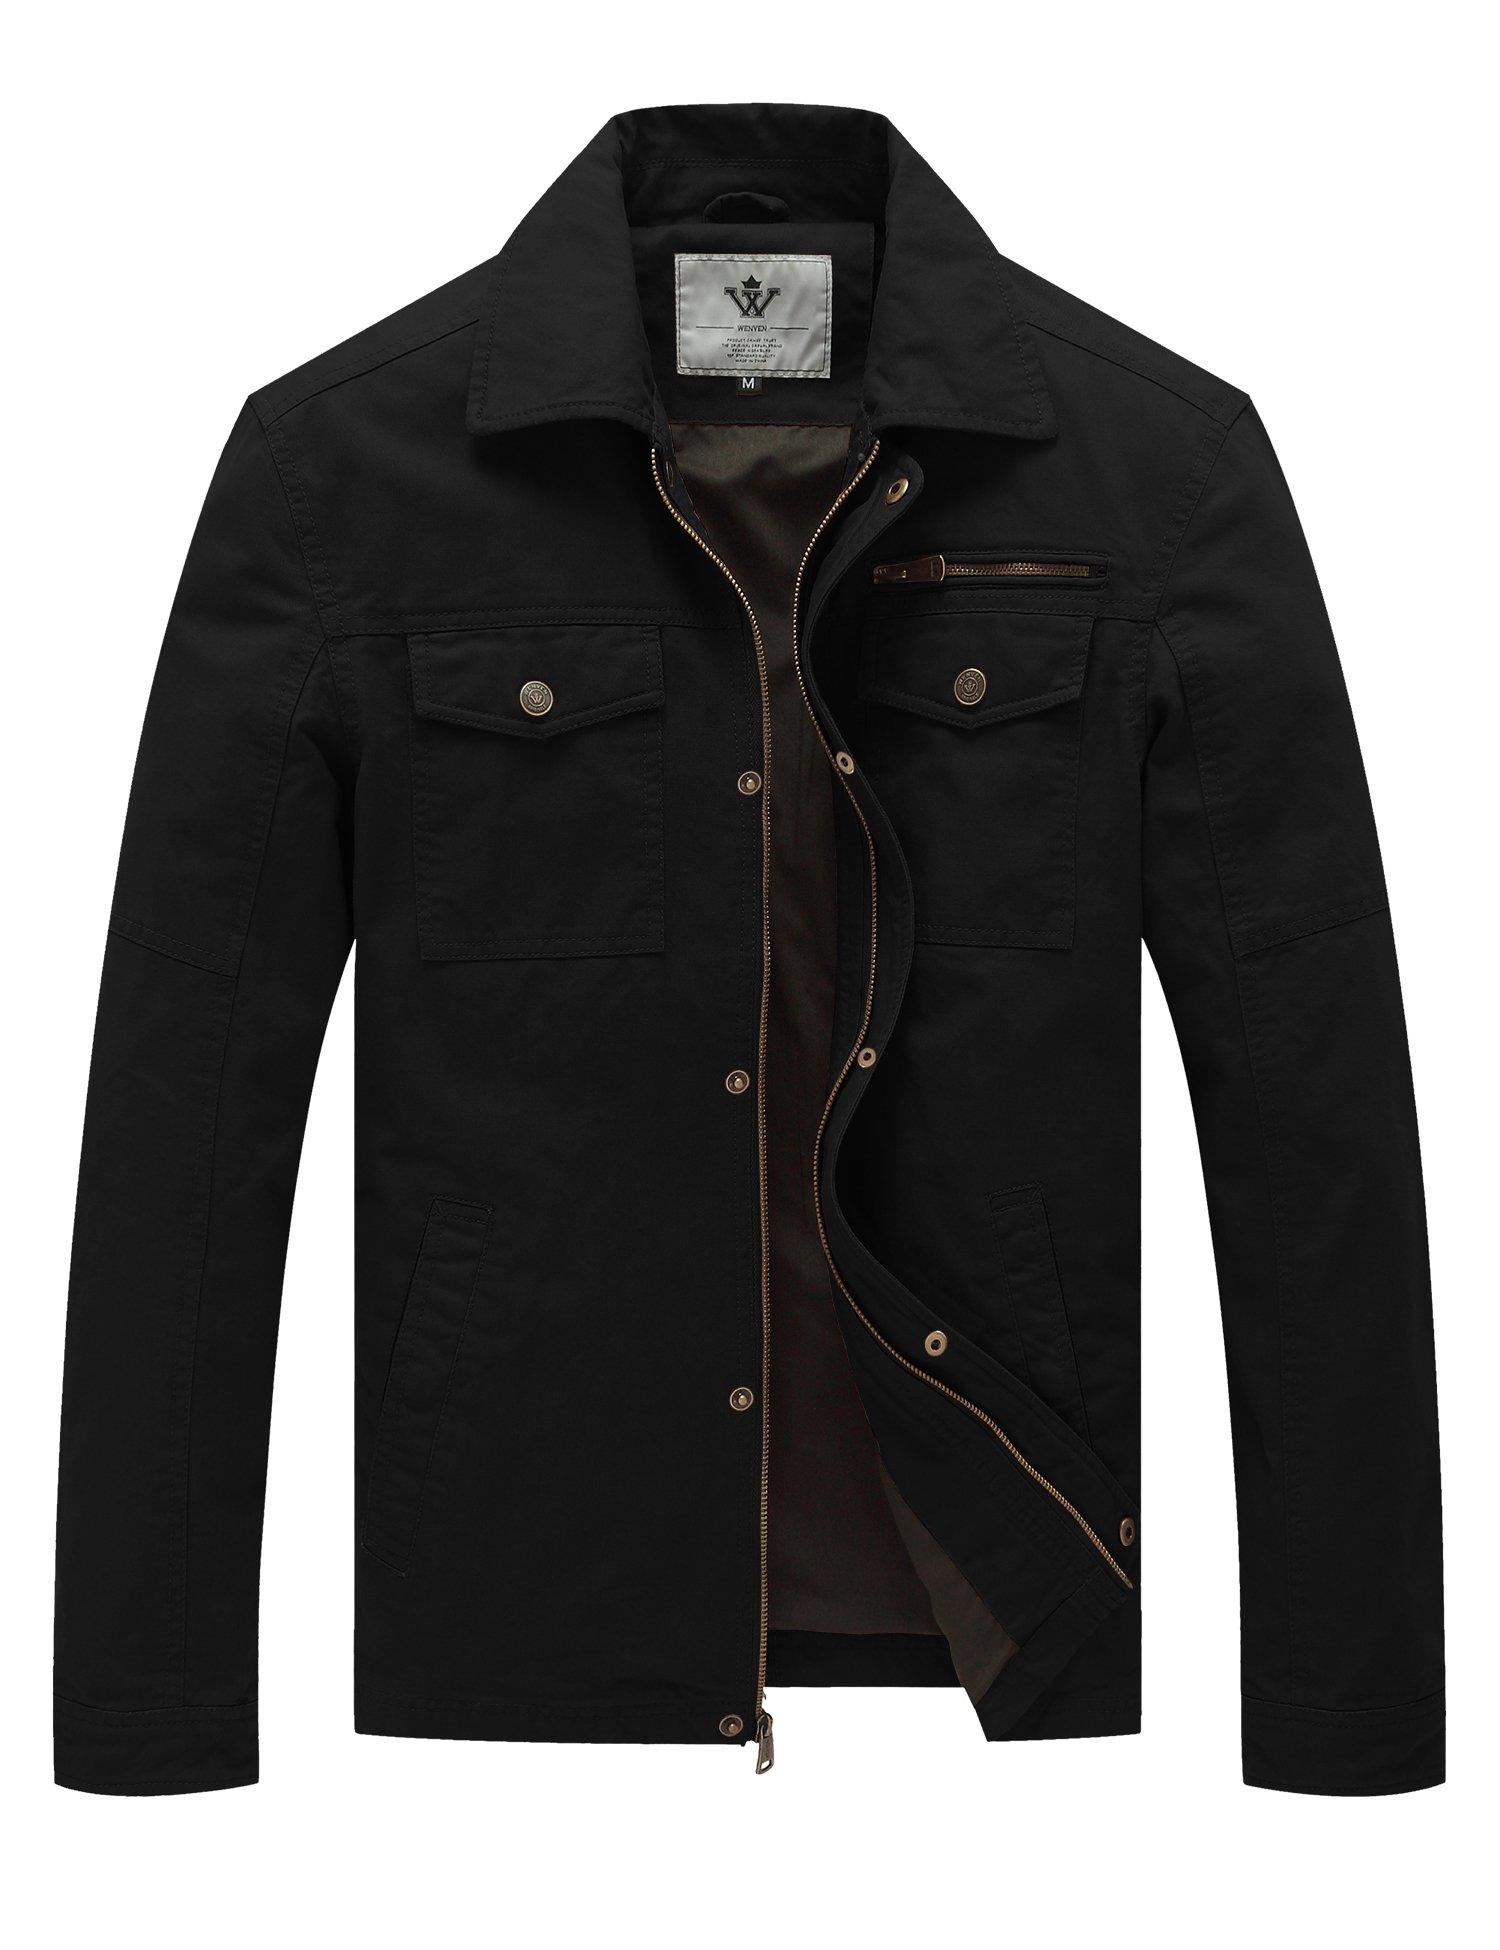 WenVen Men's Field Cotton Lined Jackets (Black, Size L)